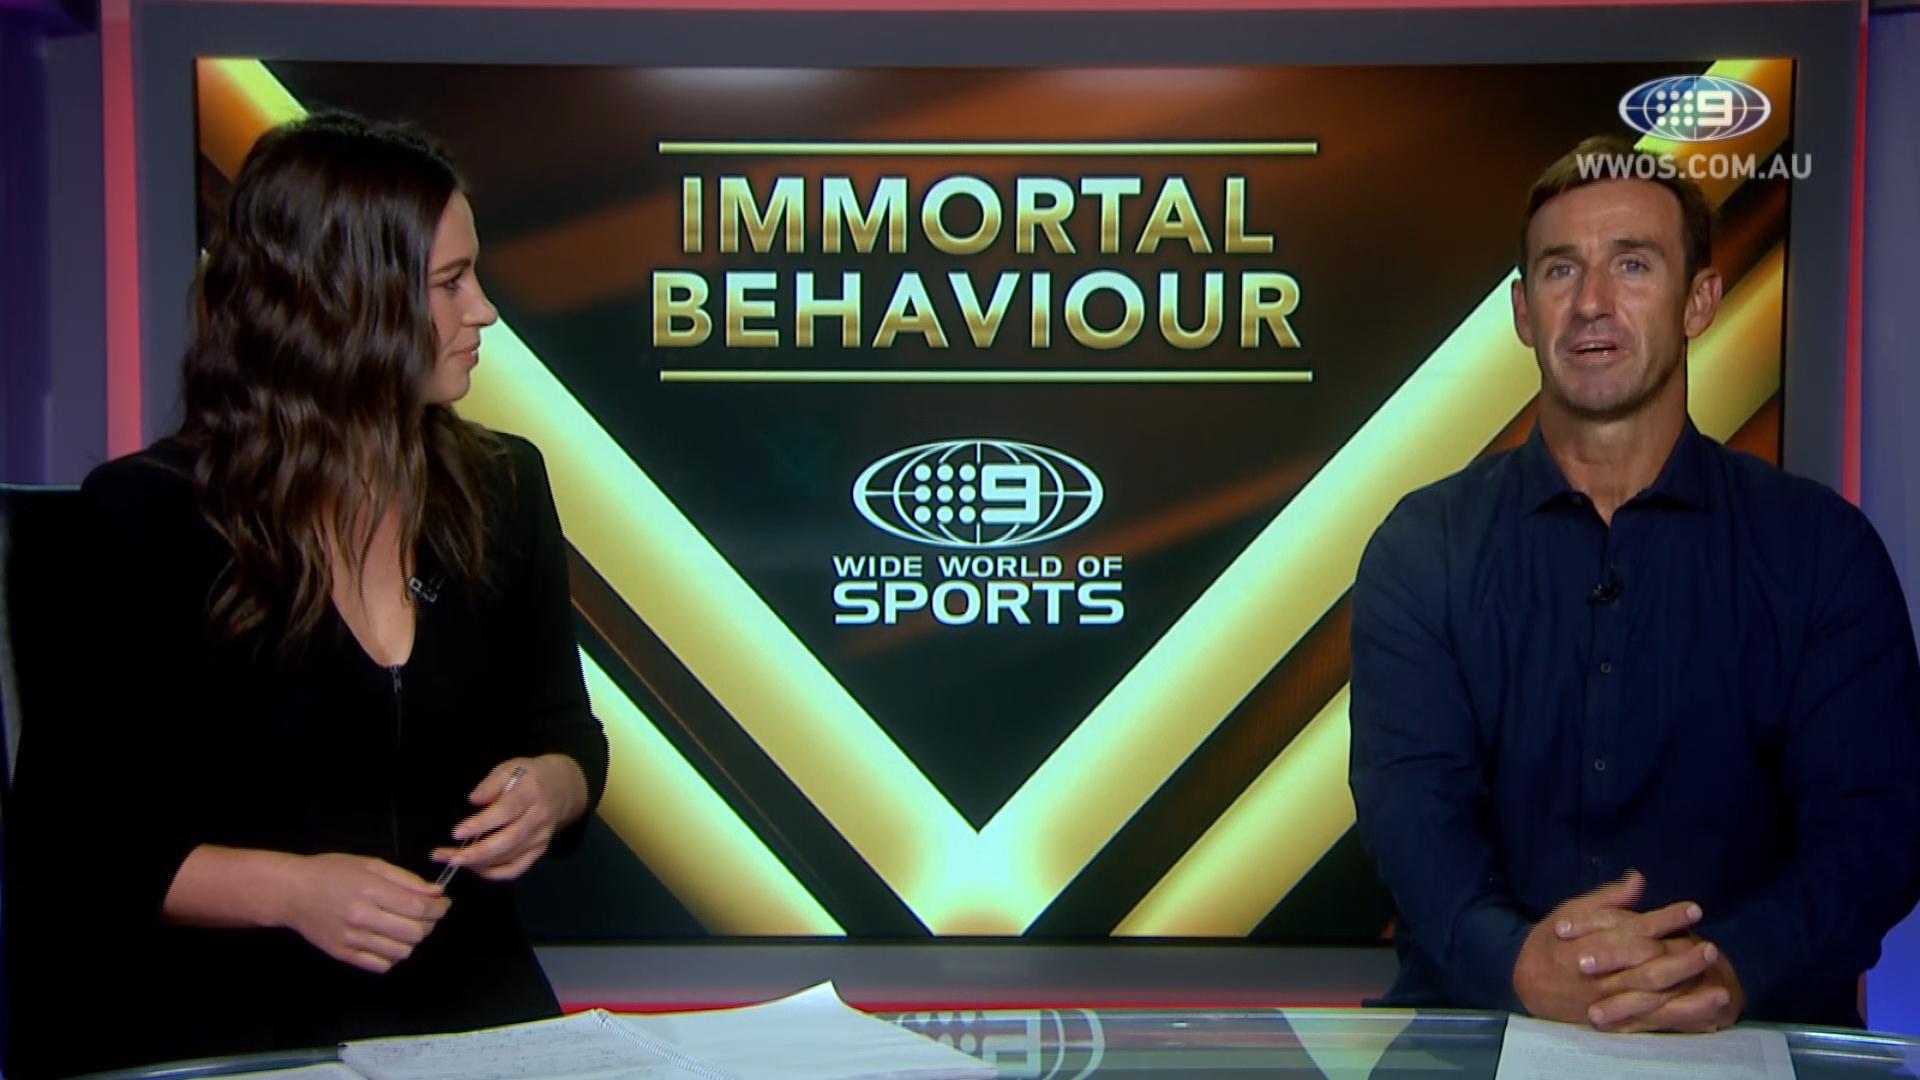 Money or an NRL Premiership: Immortal Behaviour